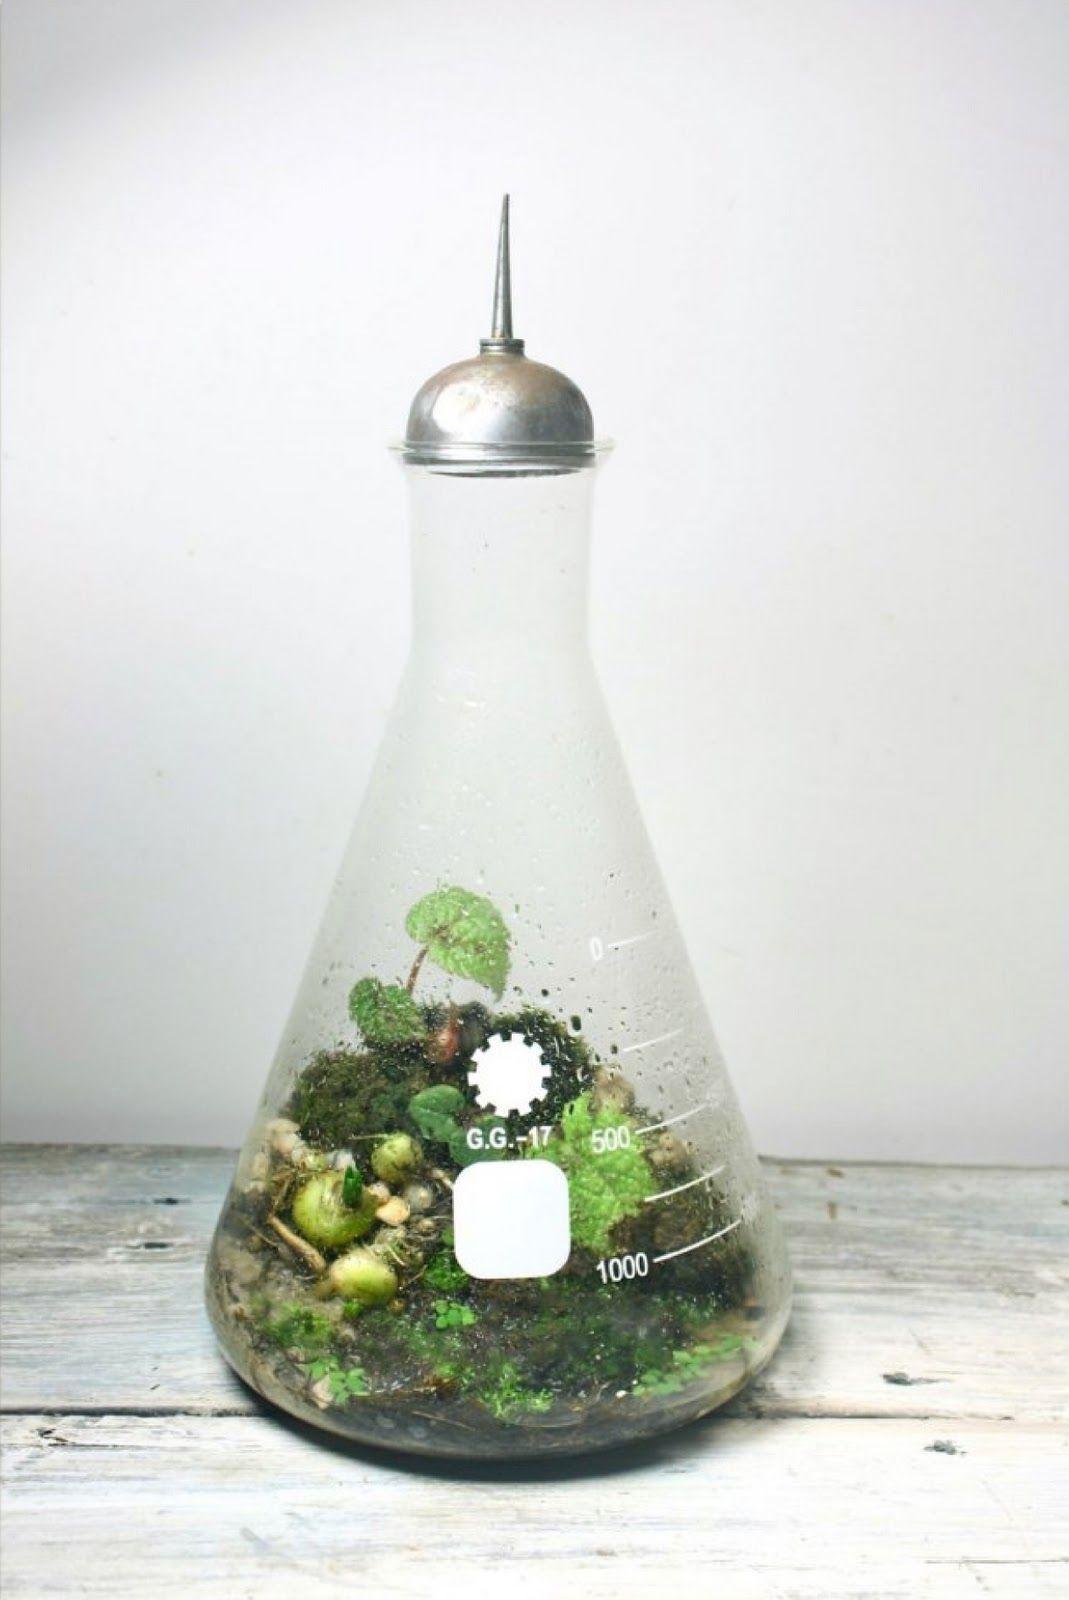 Marvelous Awesome Beaker Terrarium, Great Idea For A Window Sill.